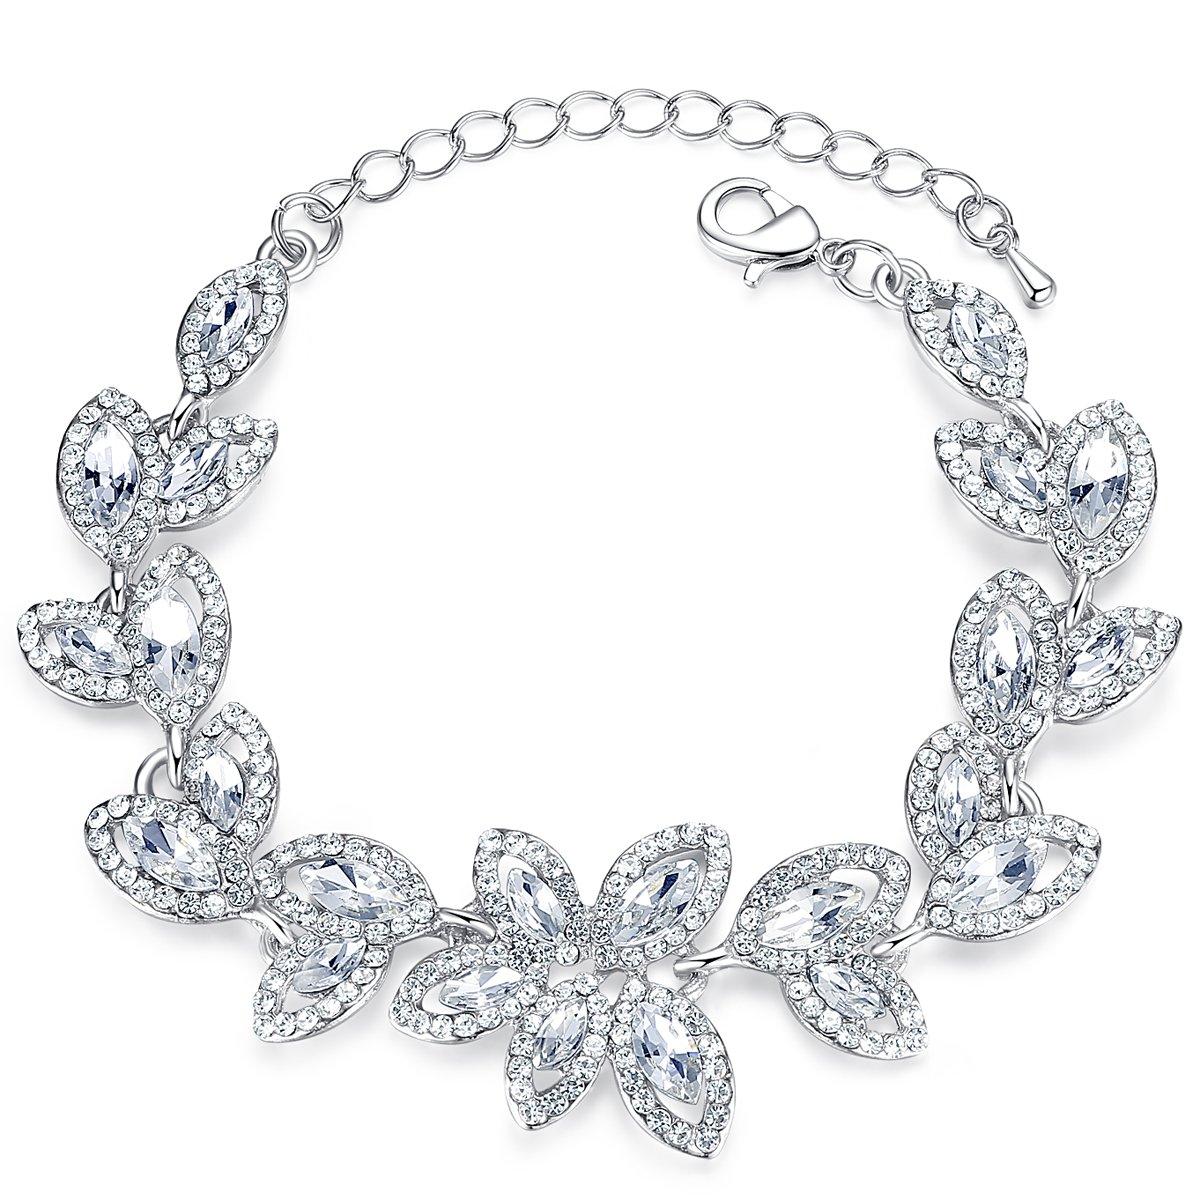 mecresh Silver Bridal Leaf Crystal Bracelet for Women Wedding Jewelry